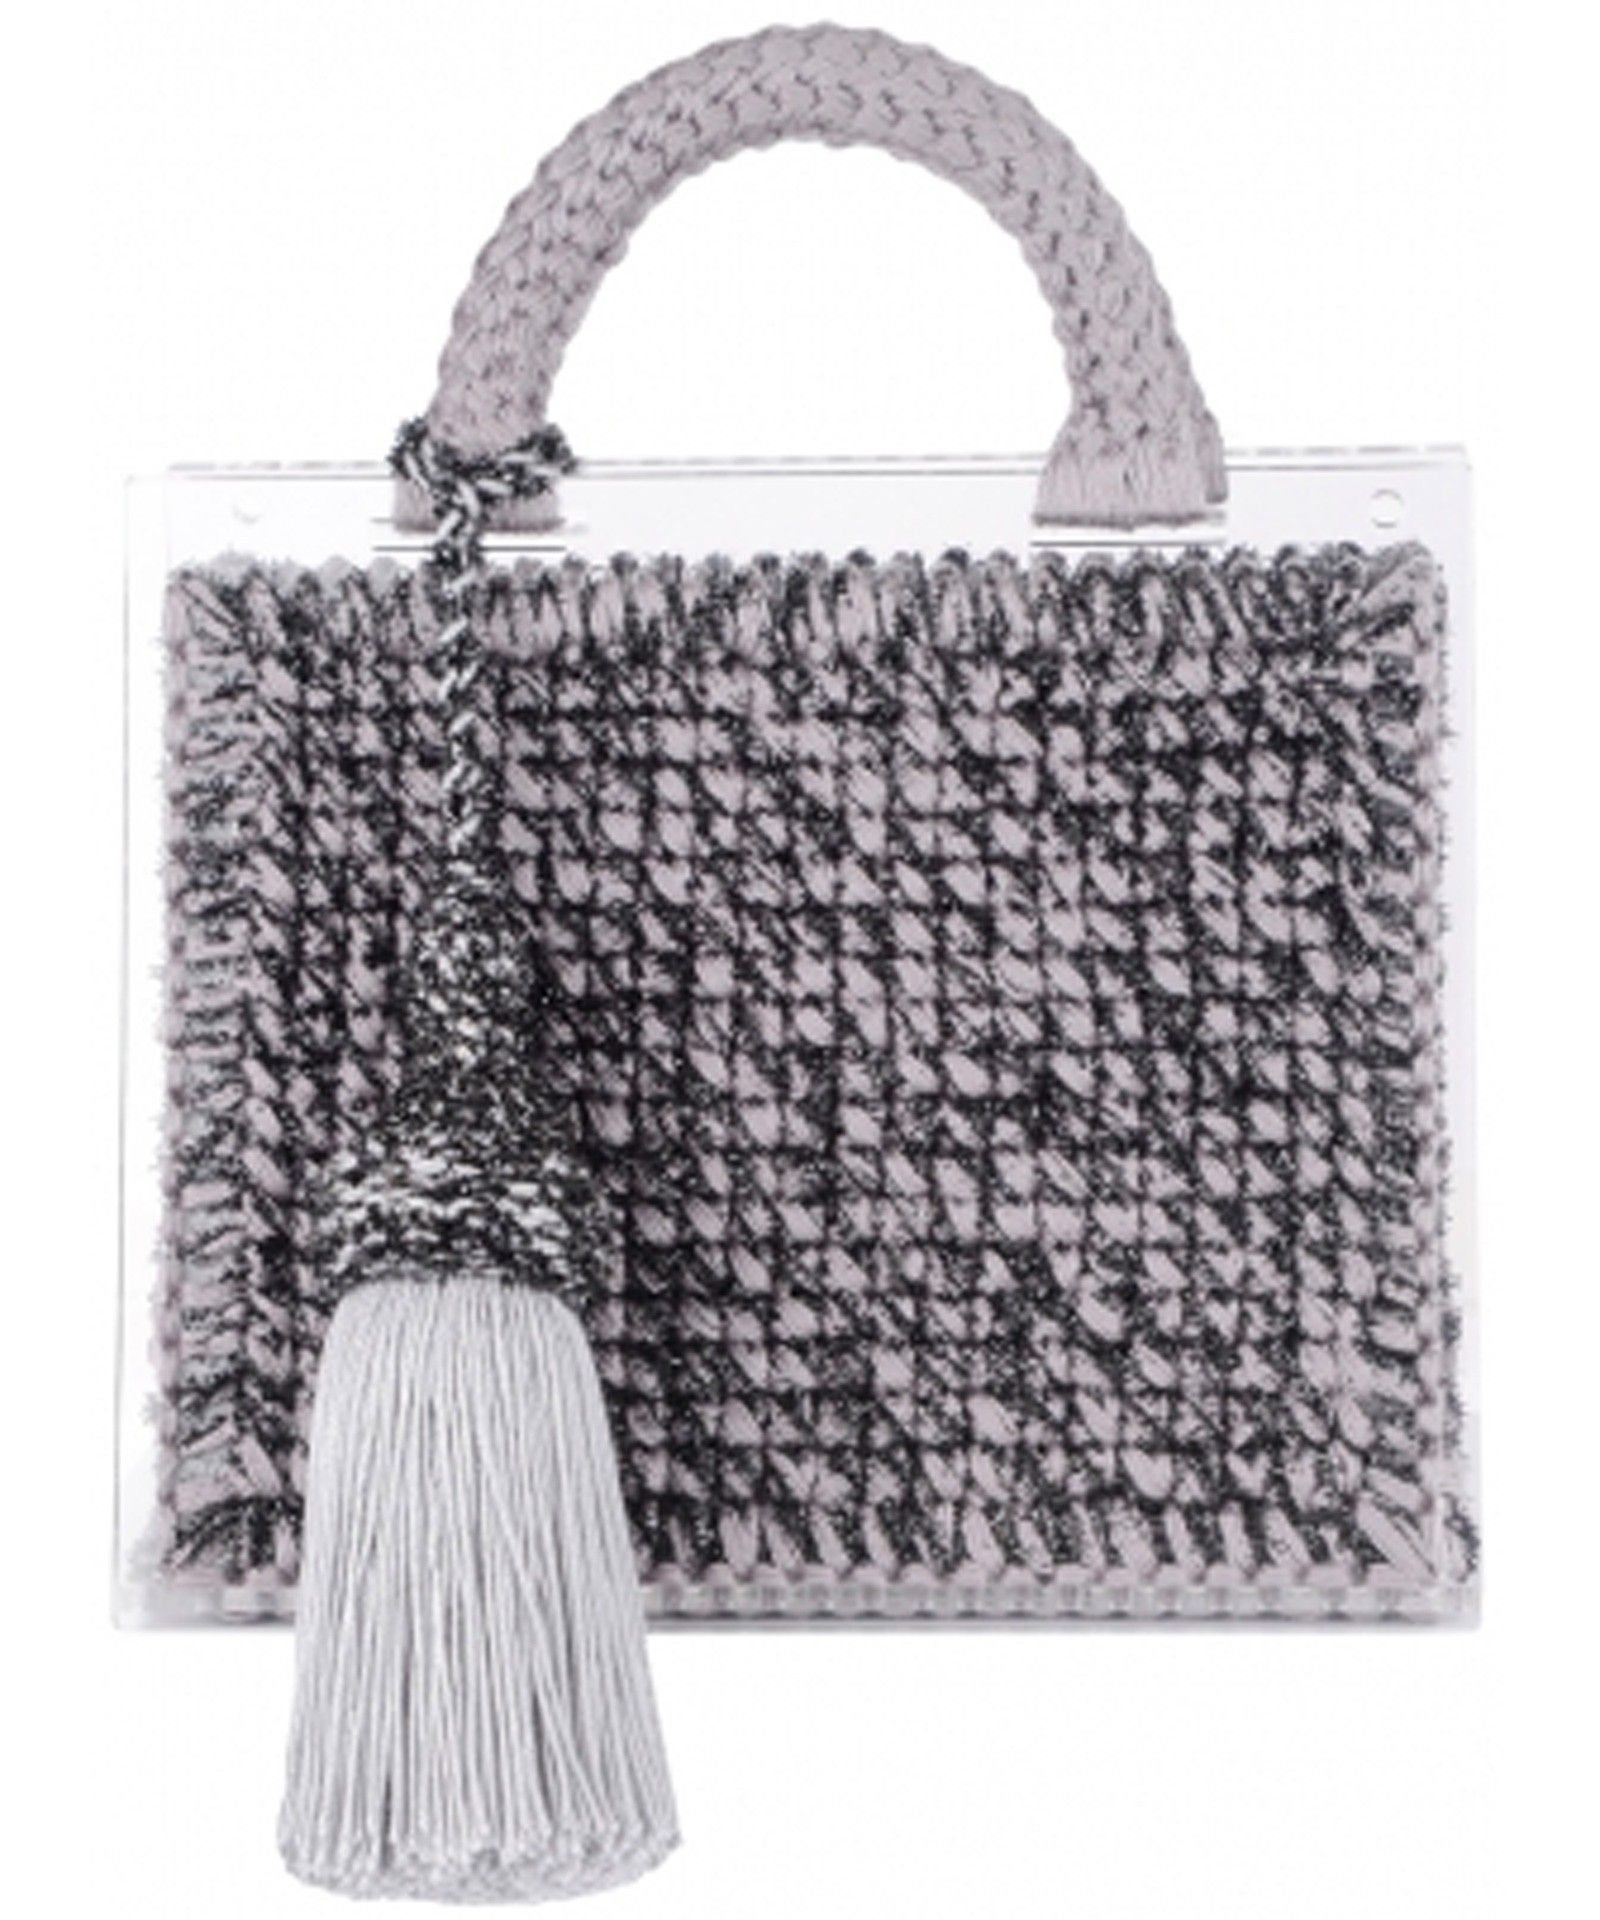 St. Barts large woven handbag - Metallic 0711 ScRhVDEx